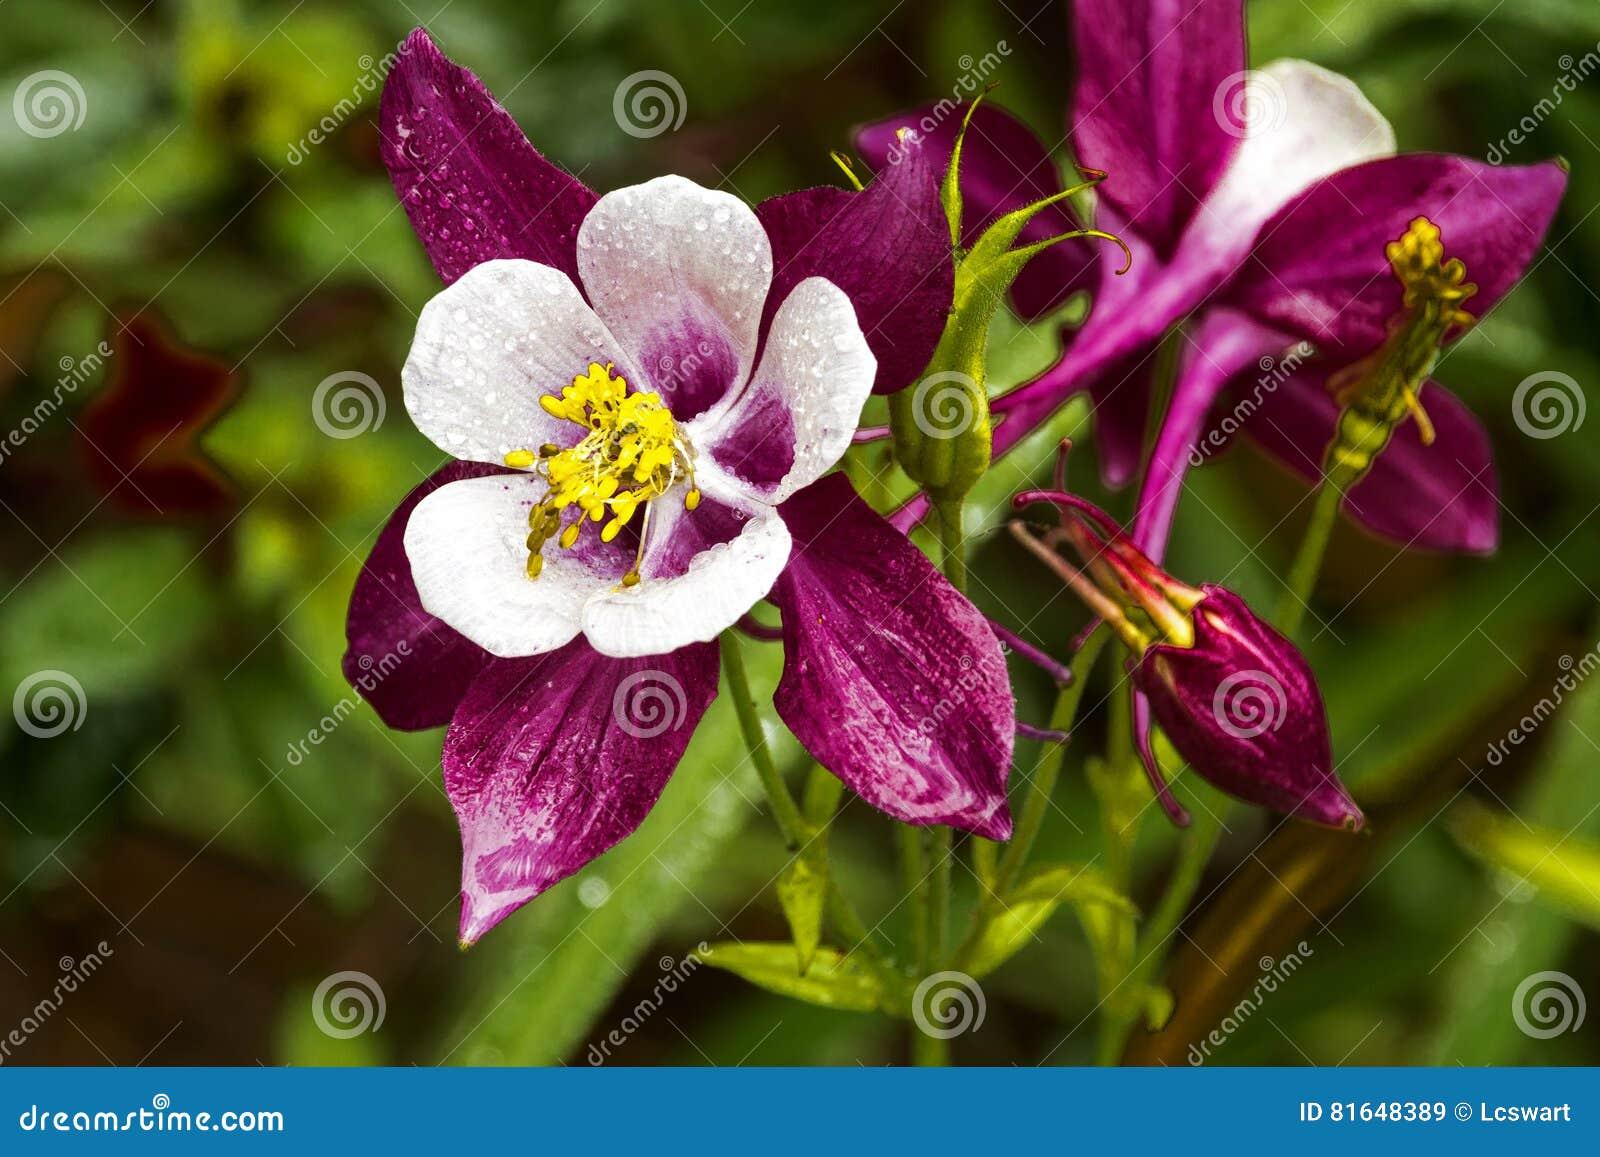 Colorful white purple and yellow aquilegia columbine flower stock colorful white purple and yellow aquilegia columbine flower dhlflorist Gallery